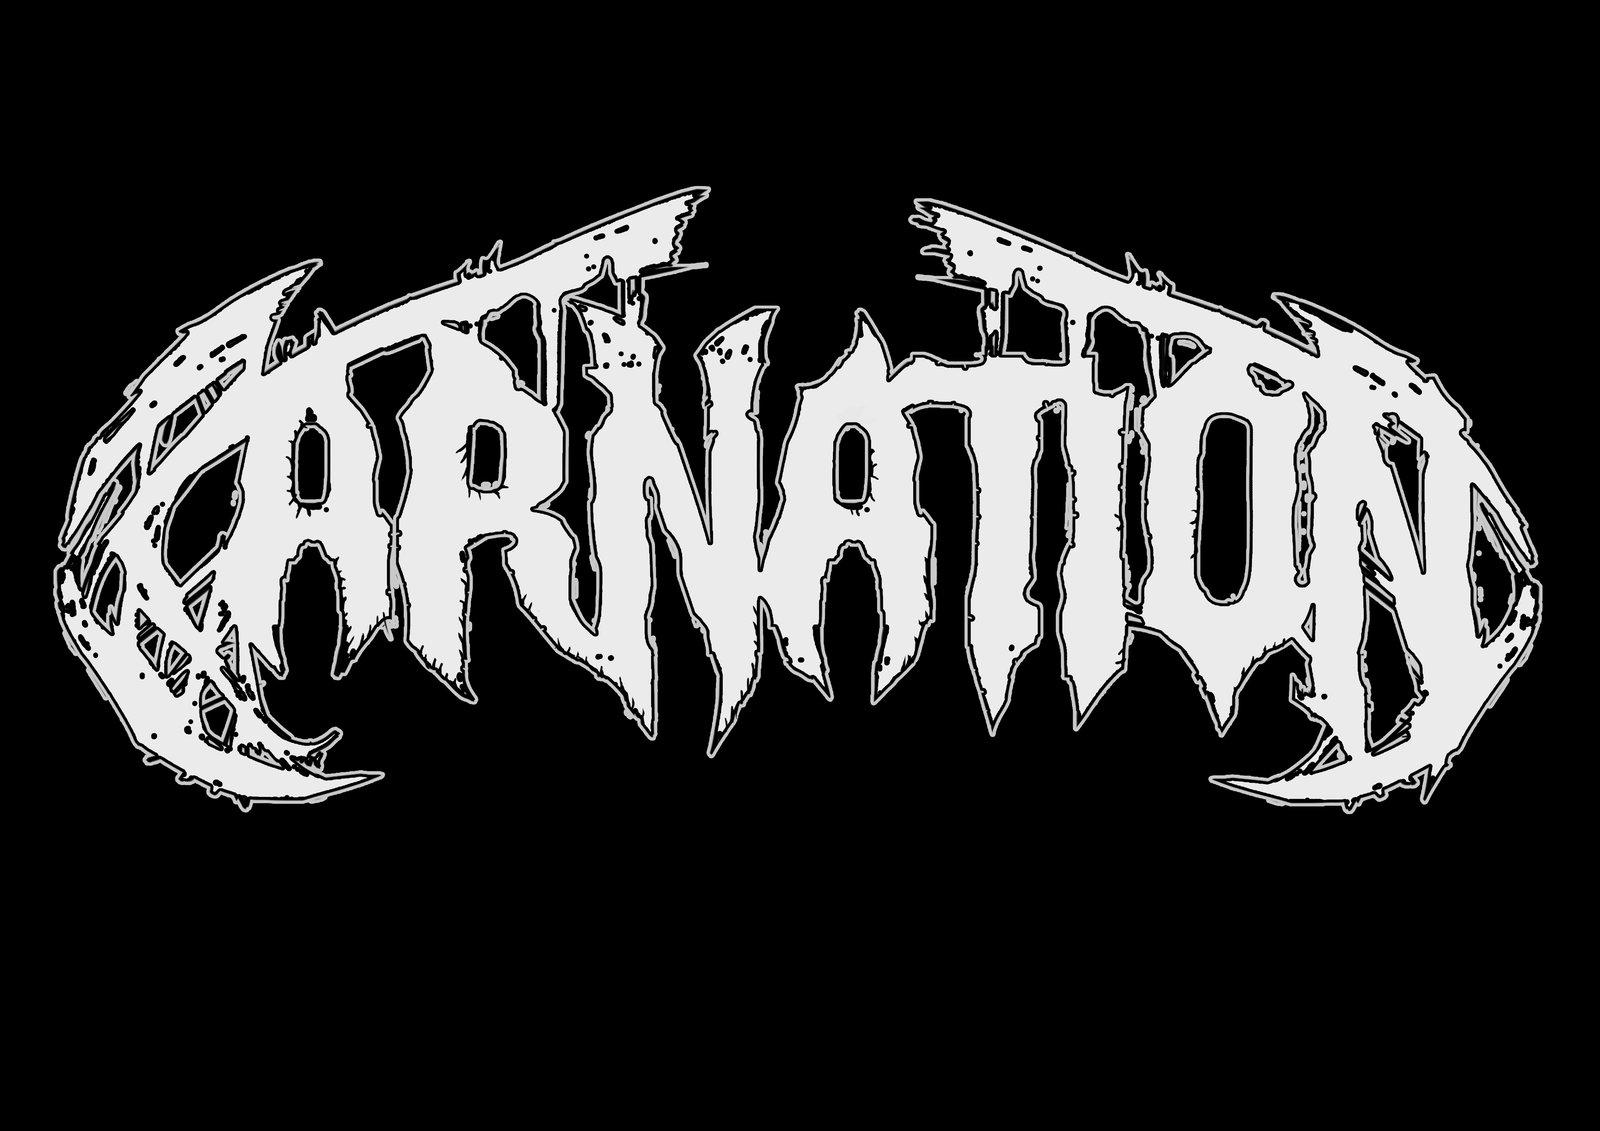 Carnation Merchandise